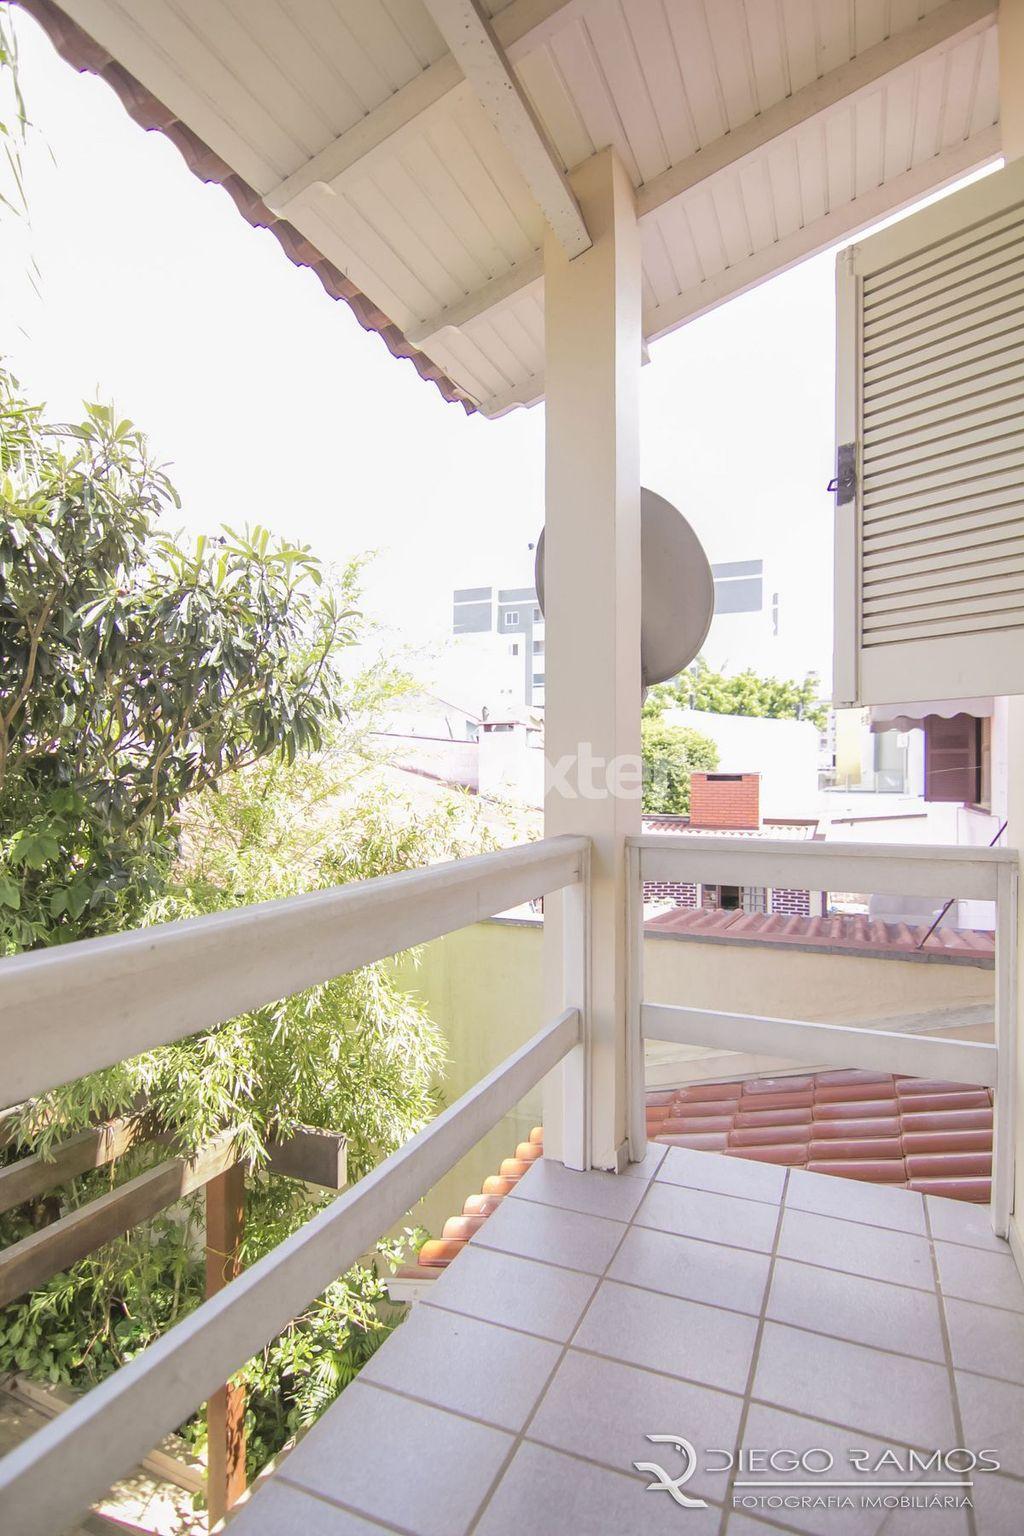 Casa 5 Dorm, Marechal Rondon, Canoas (143576) - Foto 44